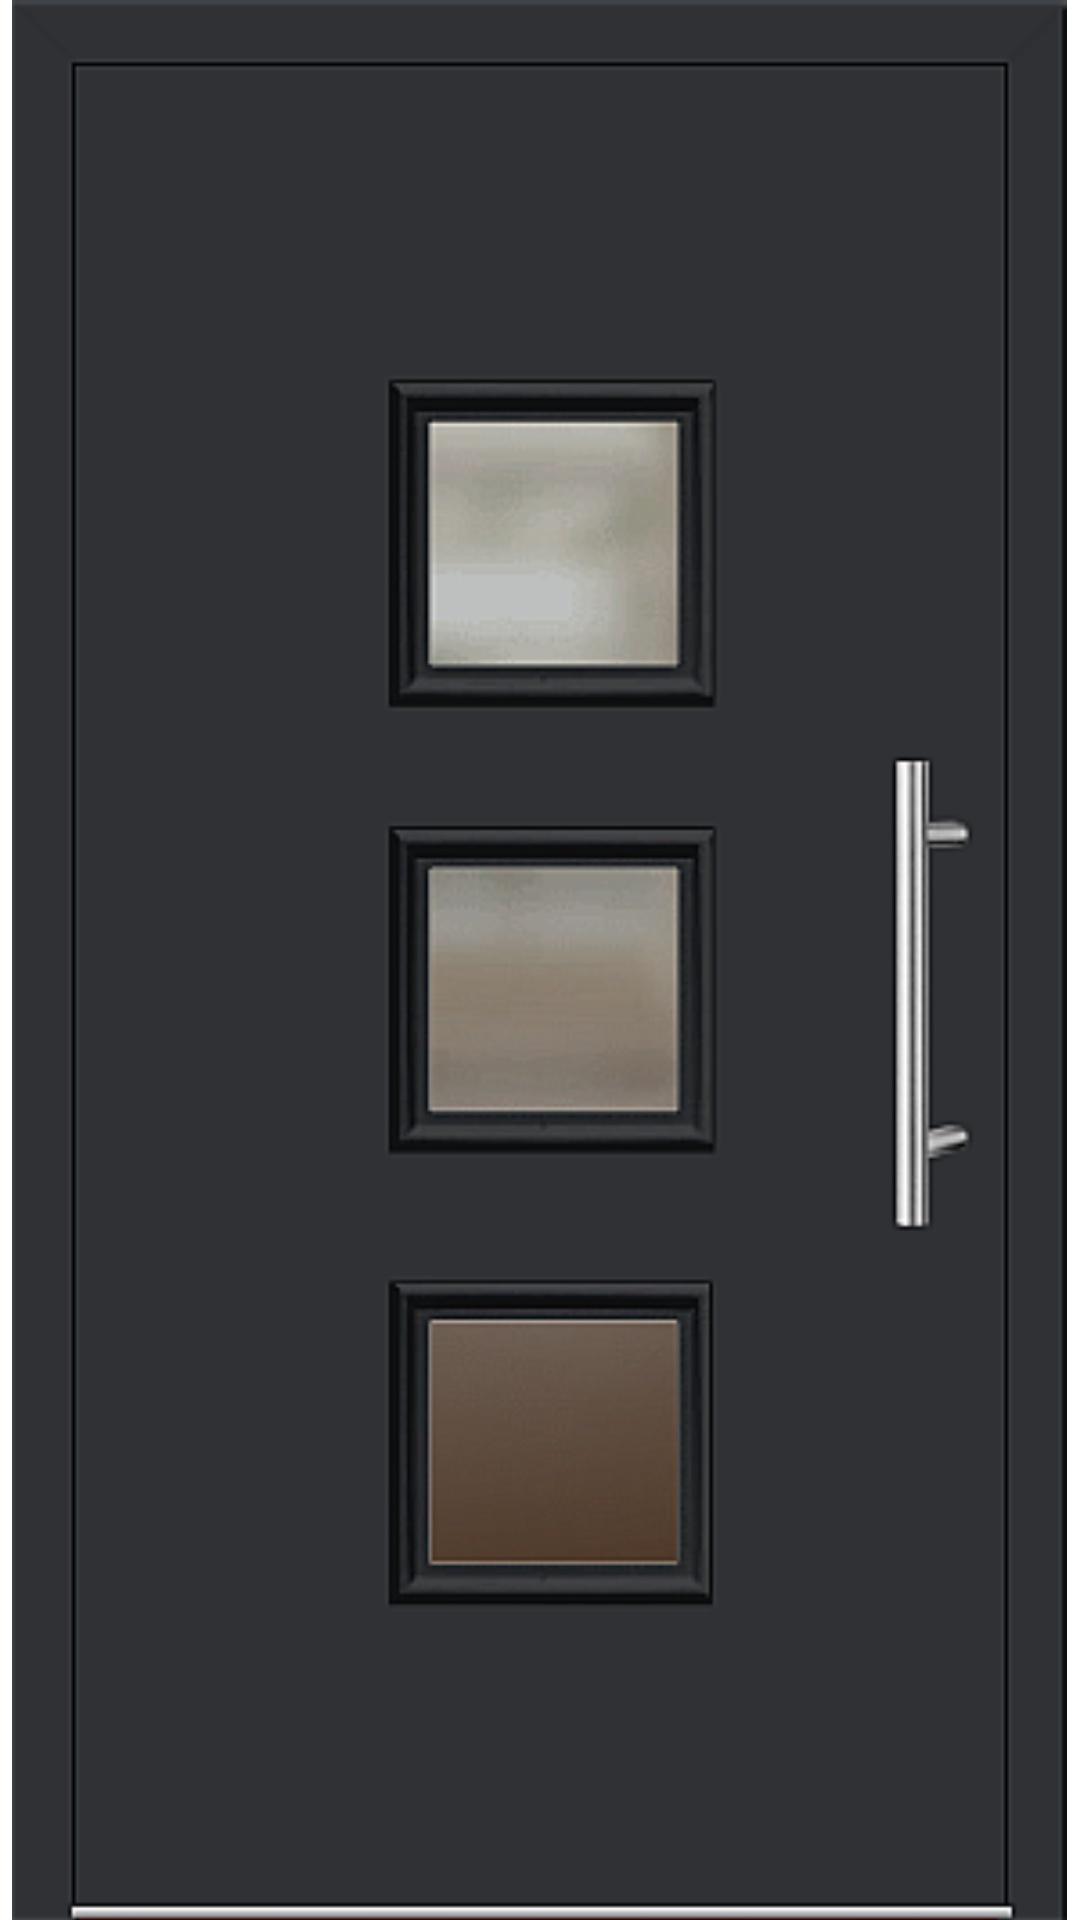 Aluminium Haustür Modell 6418-60 schwarz